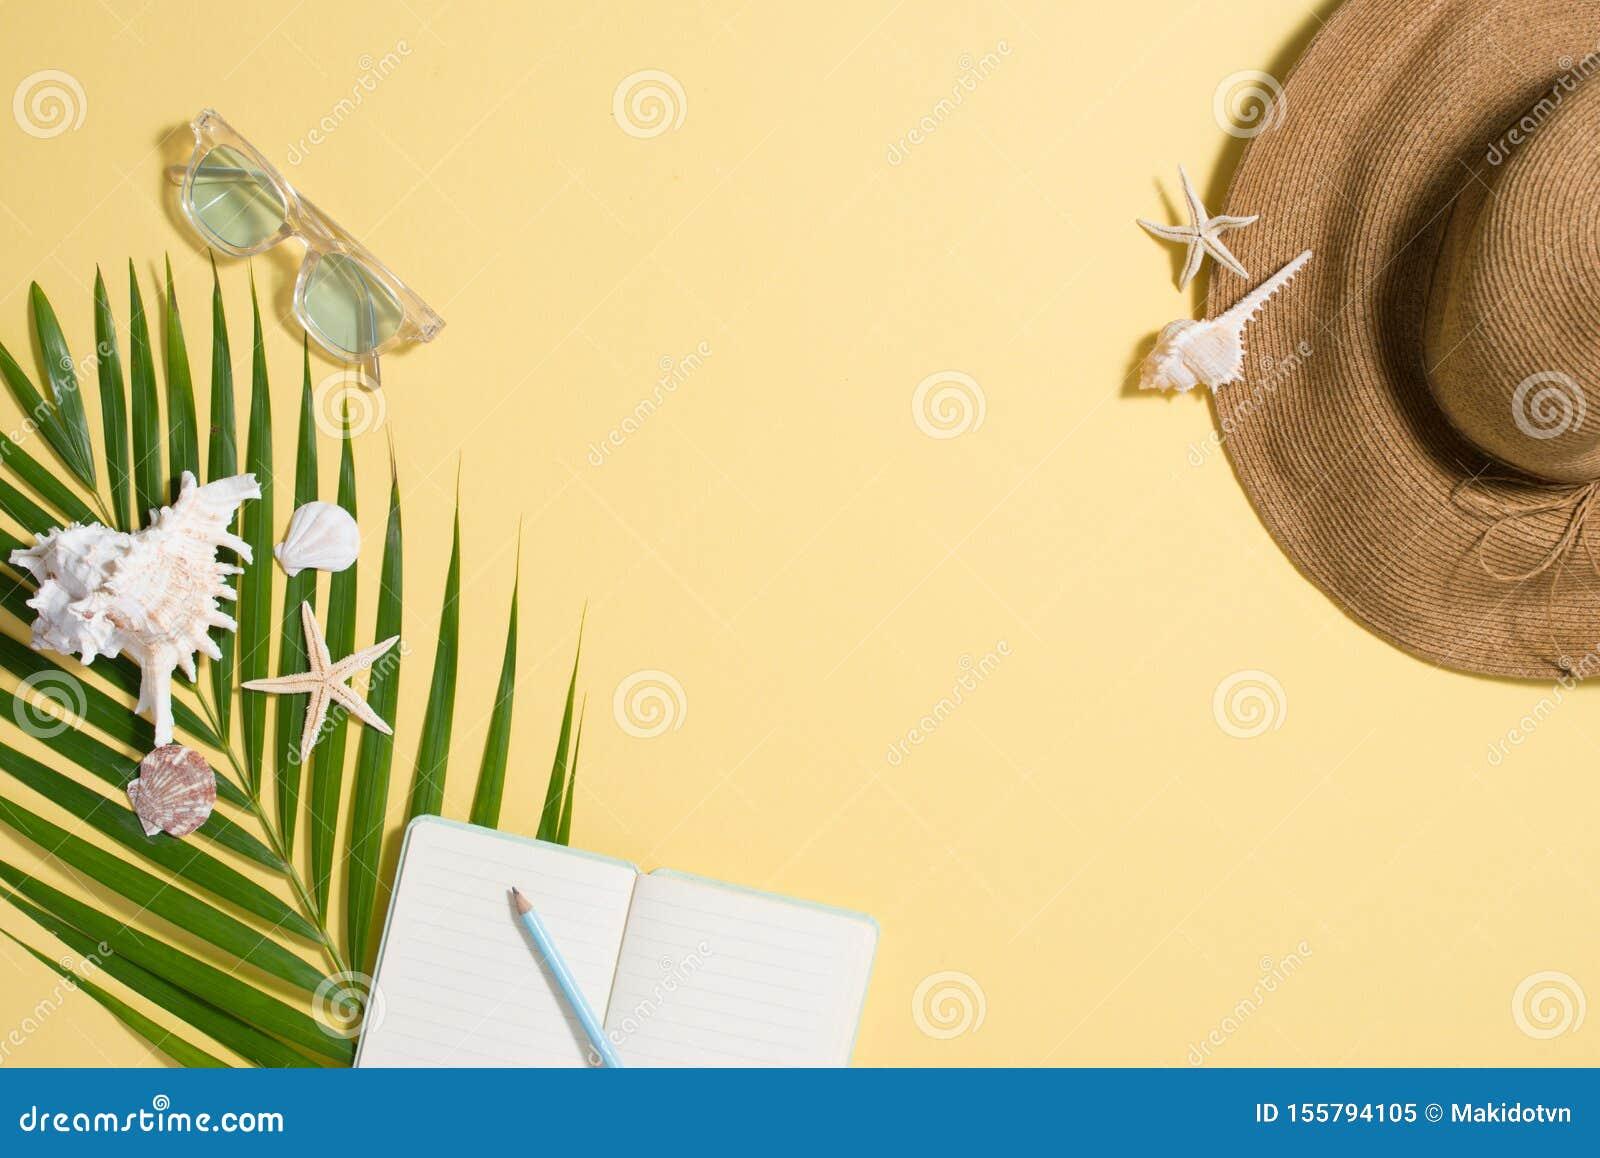 Colorful summer holidays fashion flat lay - straw hat, sunglasses, sea shells on bright yellow background